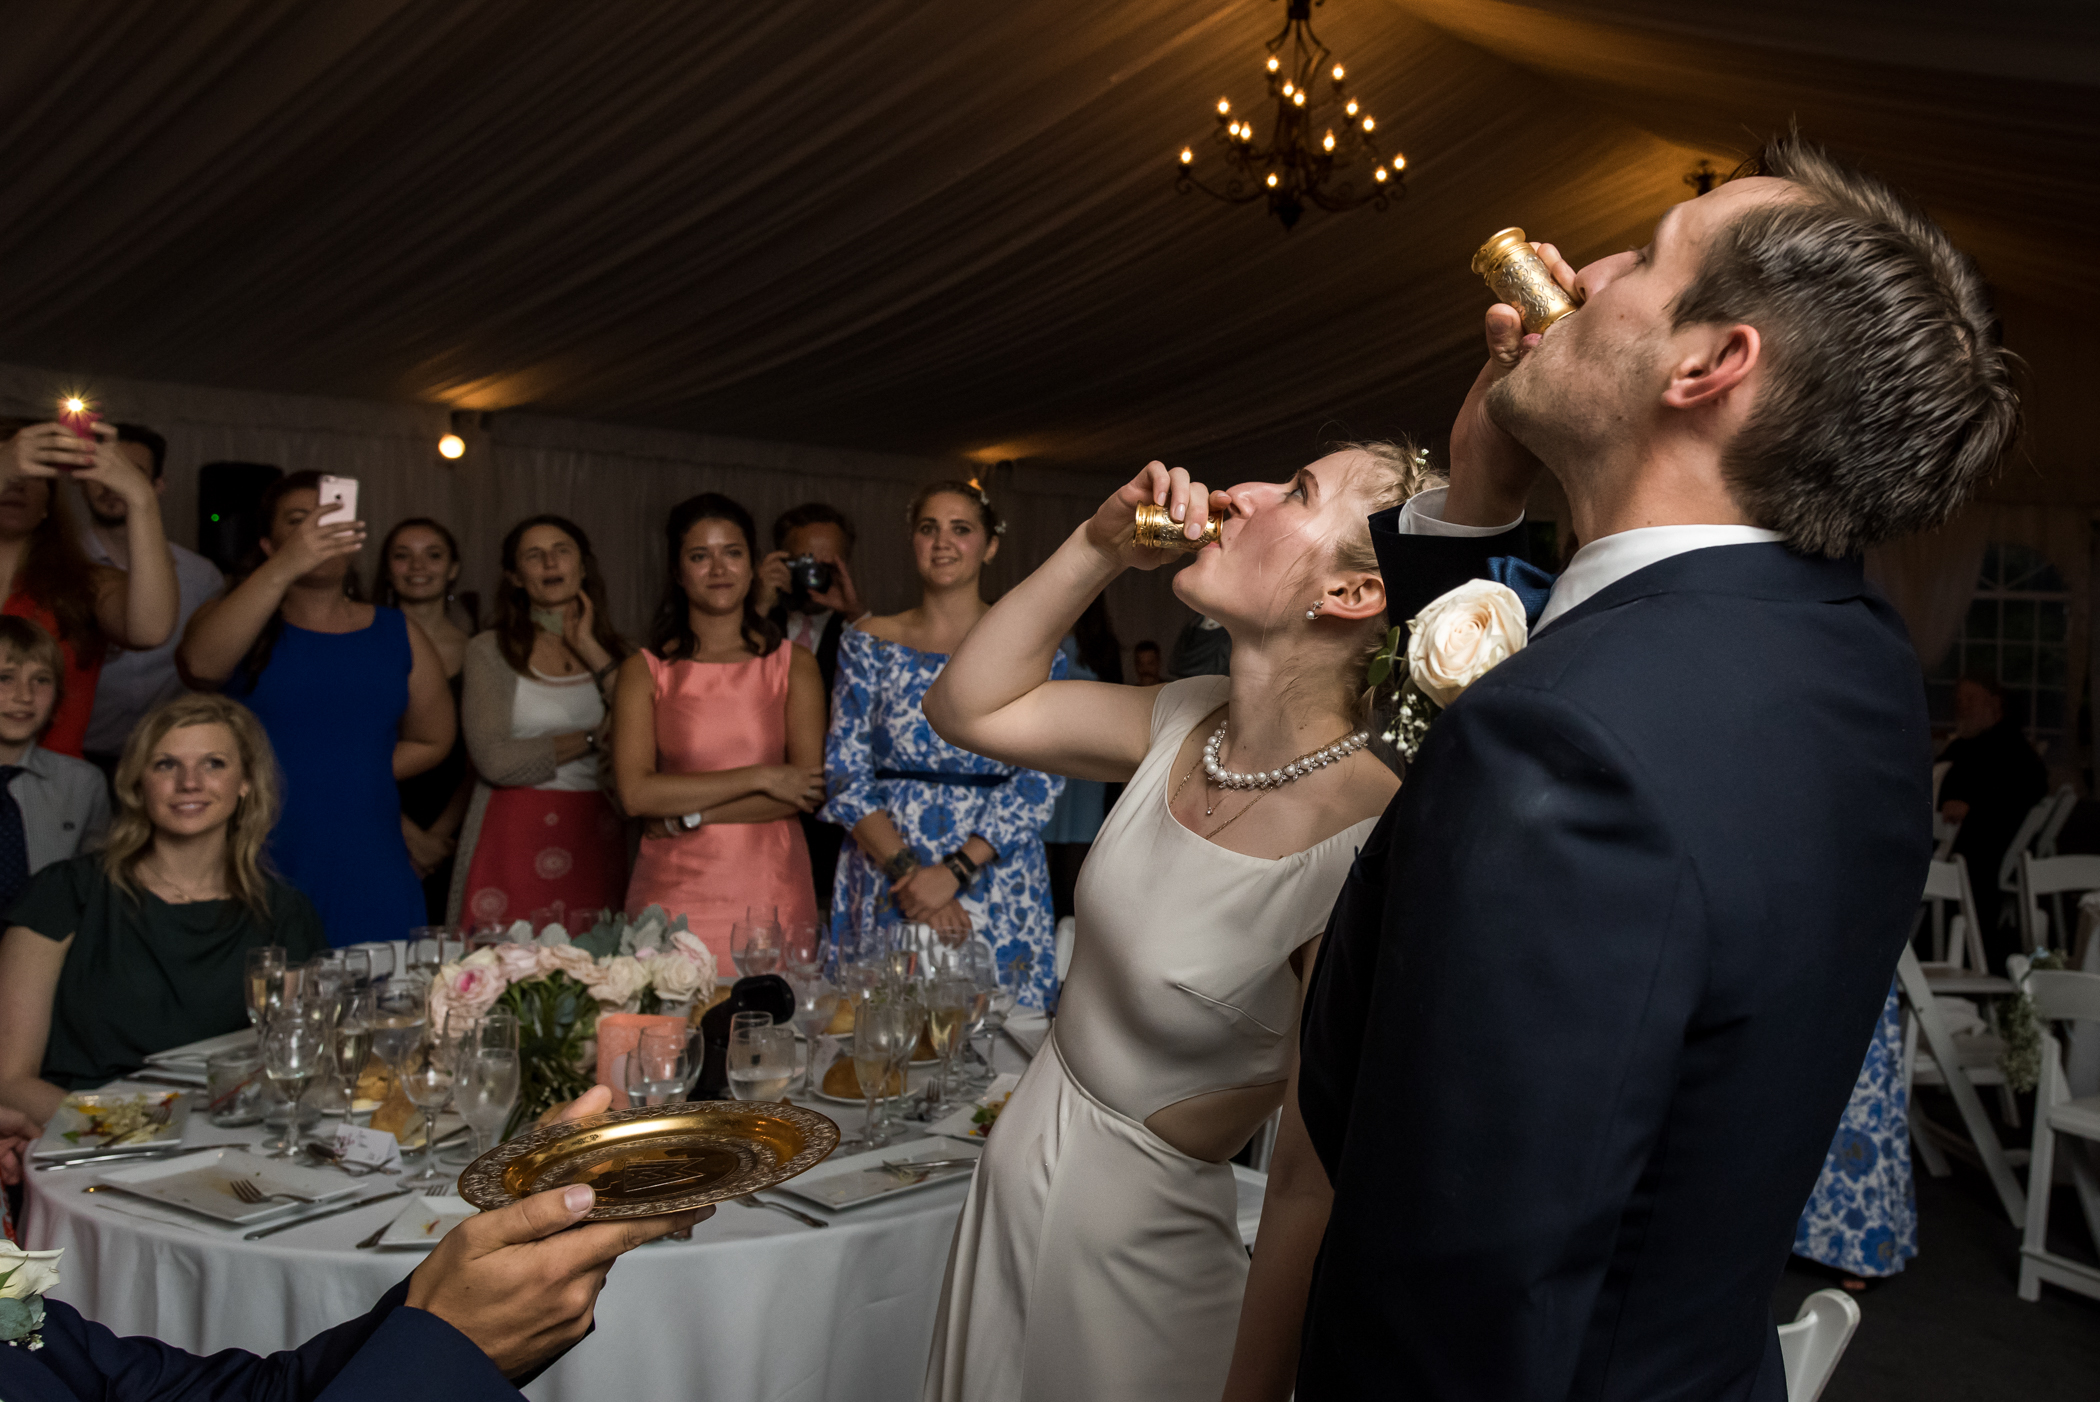 Stefy Hilmer Photography-russian drinking ritual during wedding reception.jpg